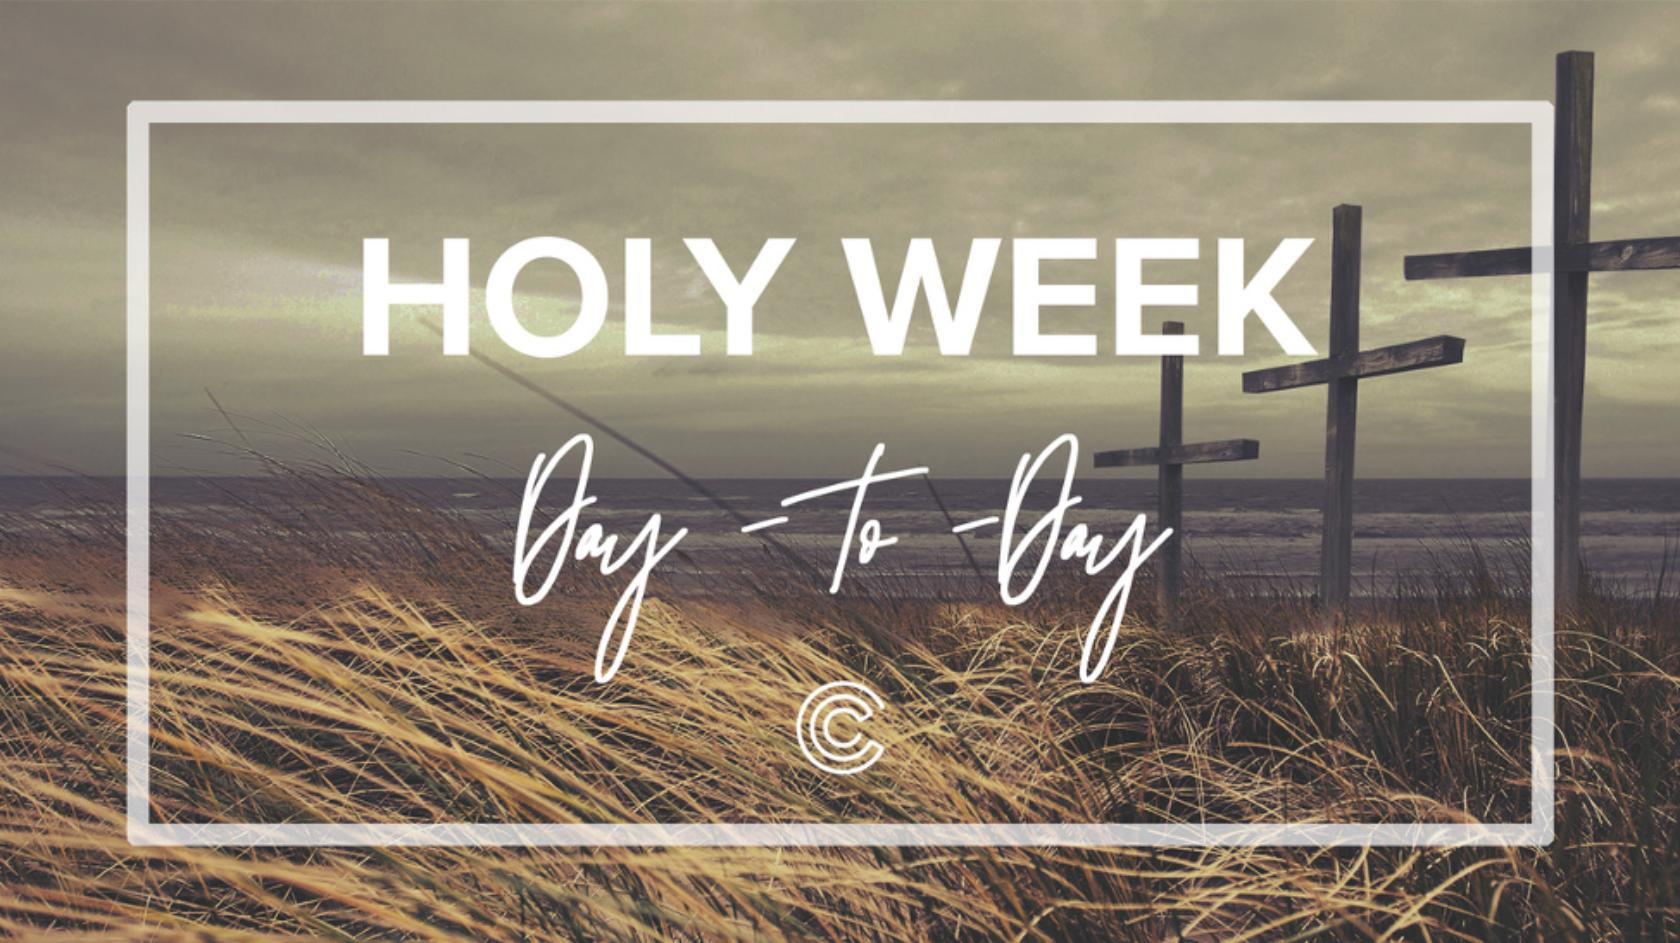 Holy Week Devo – Day 1 (Palm Sunday)